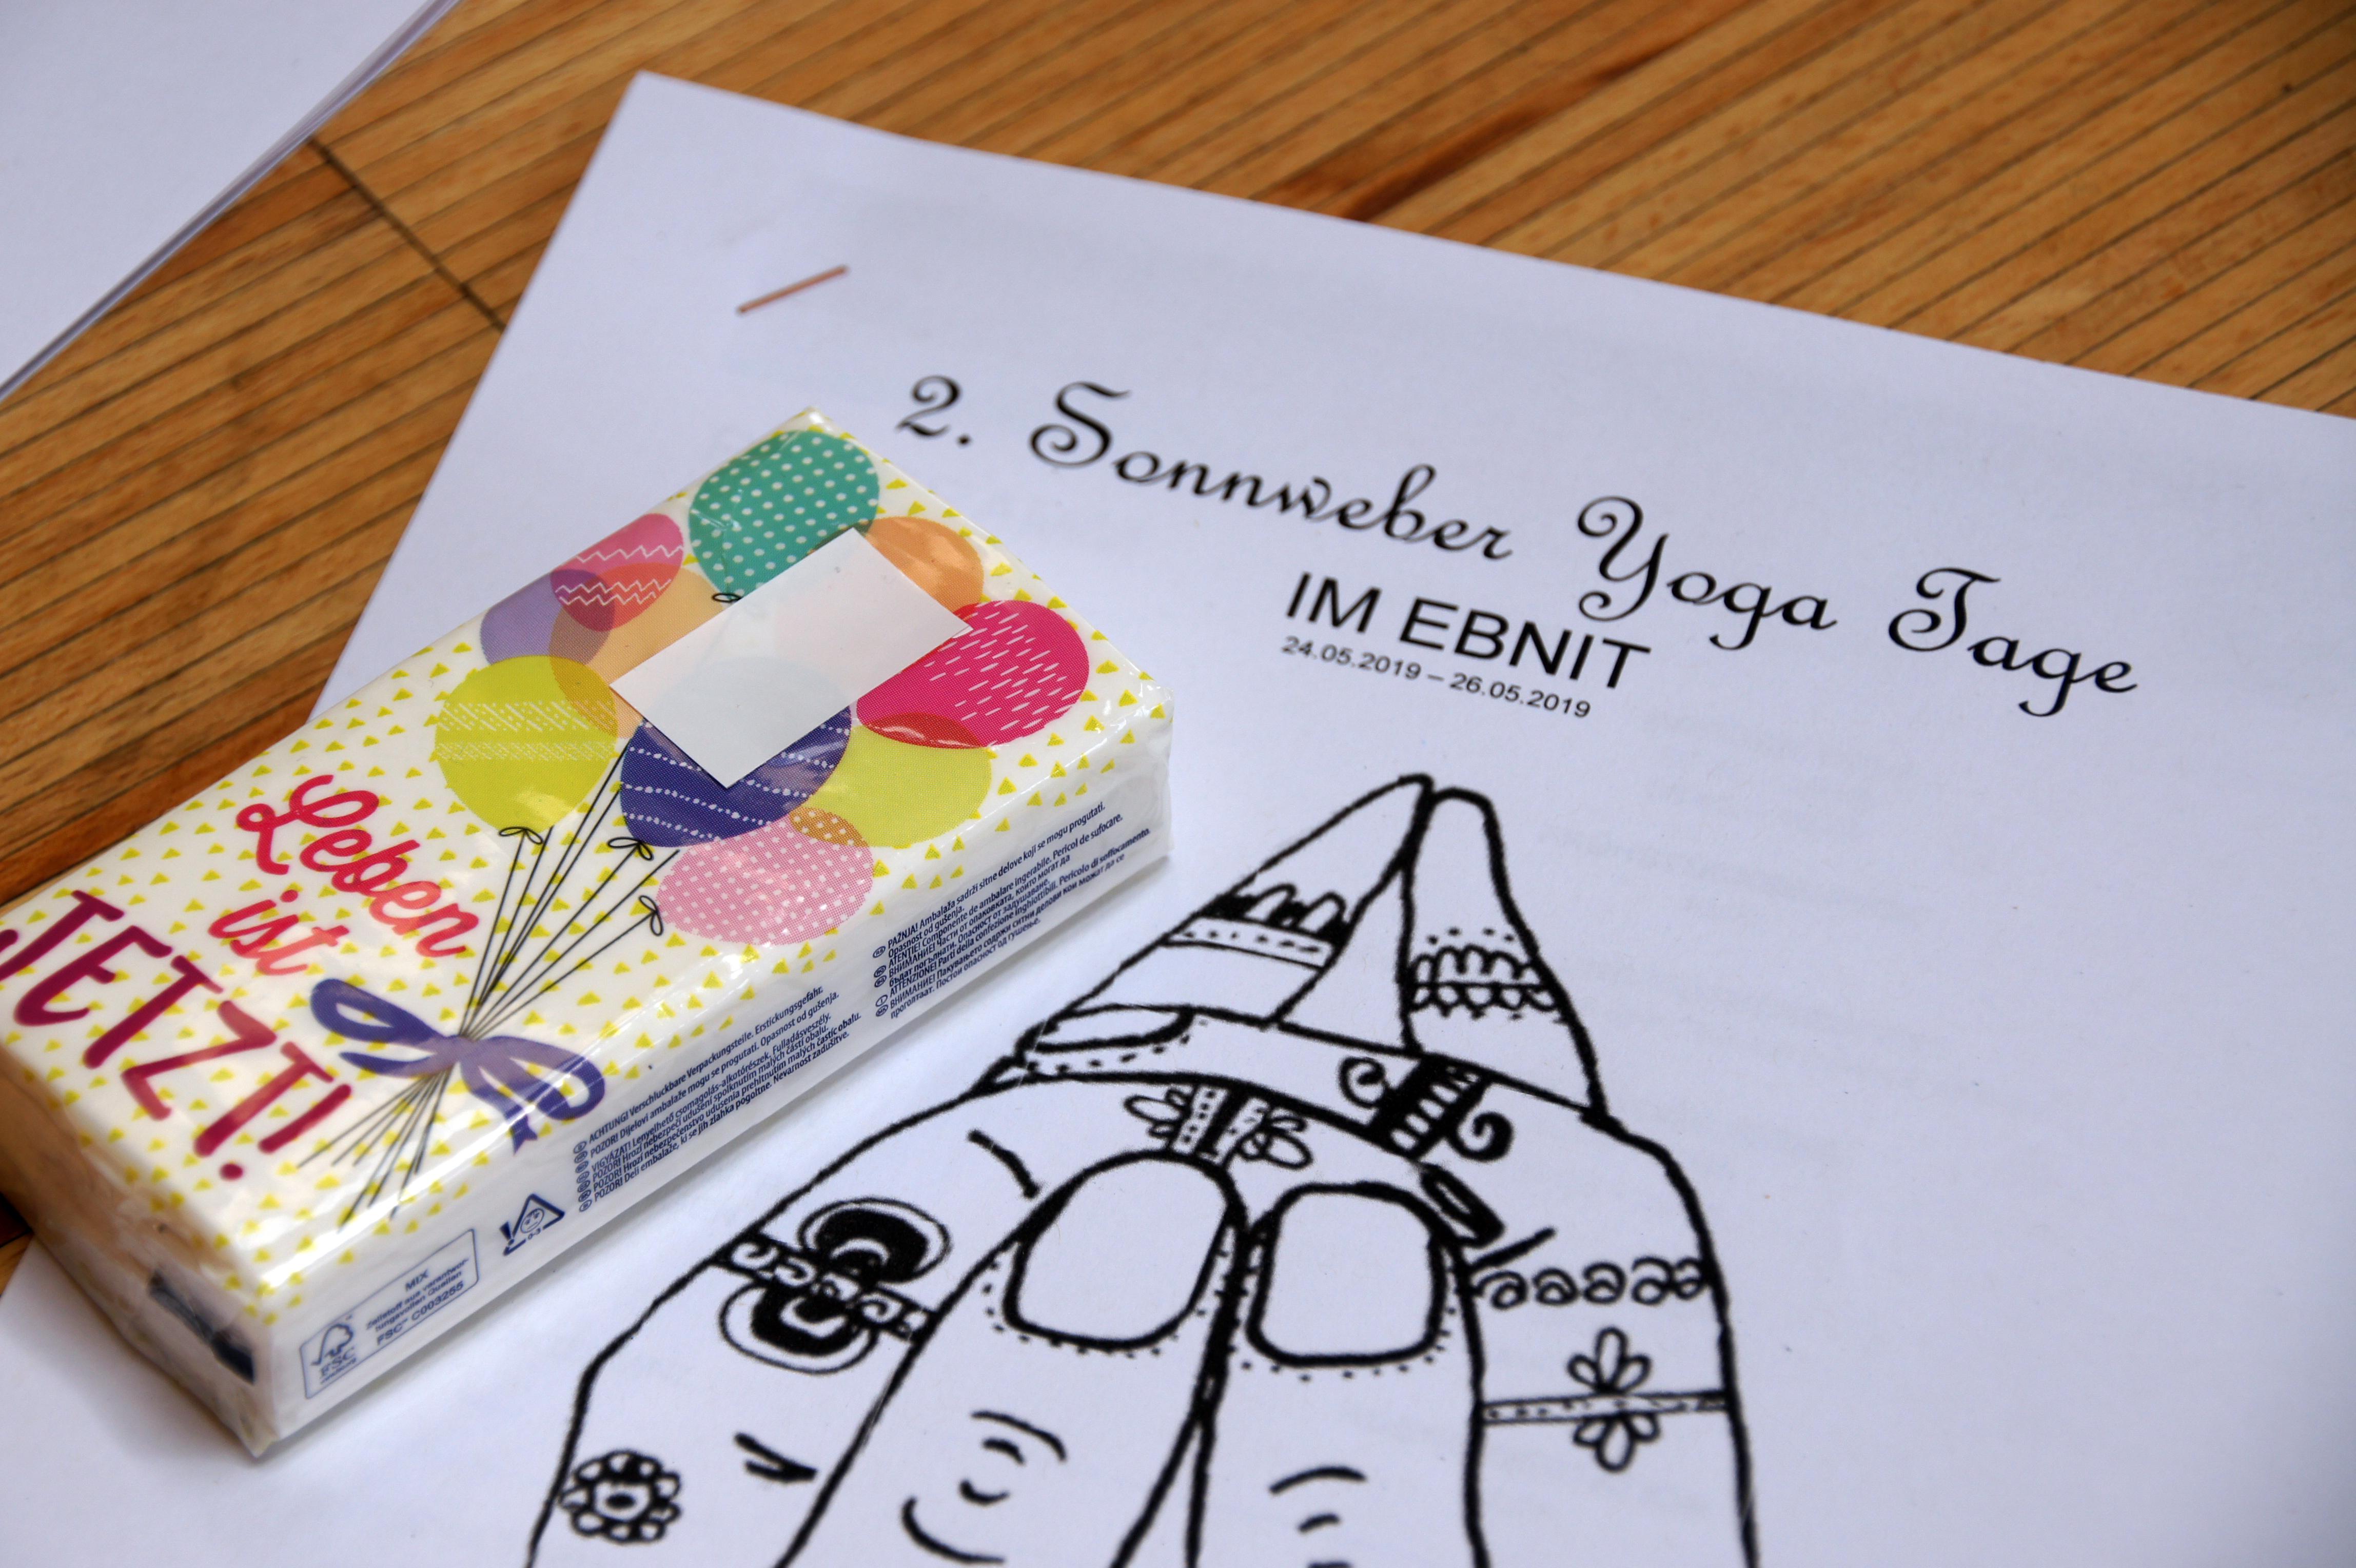 2. Sonnweber Yoga Tage